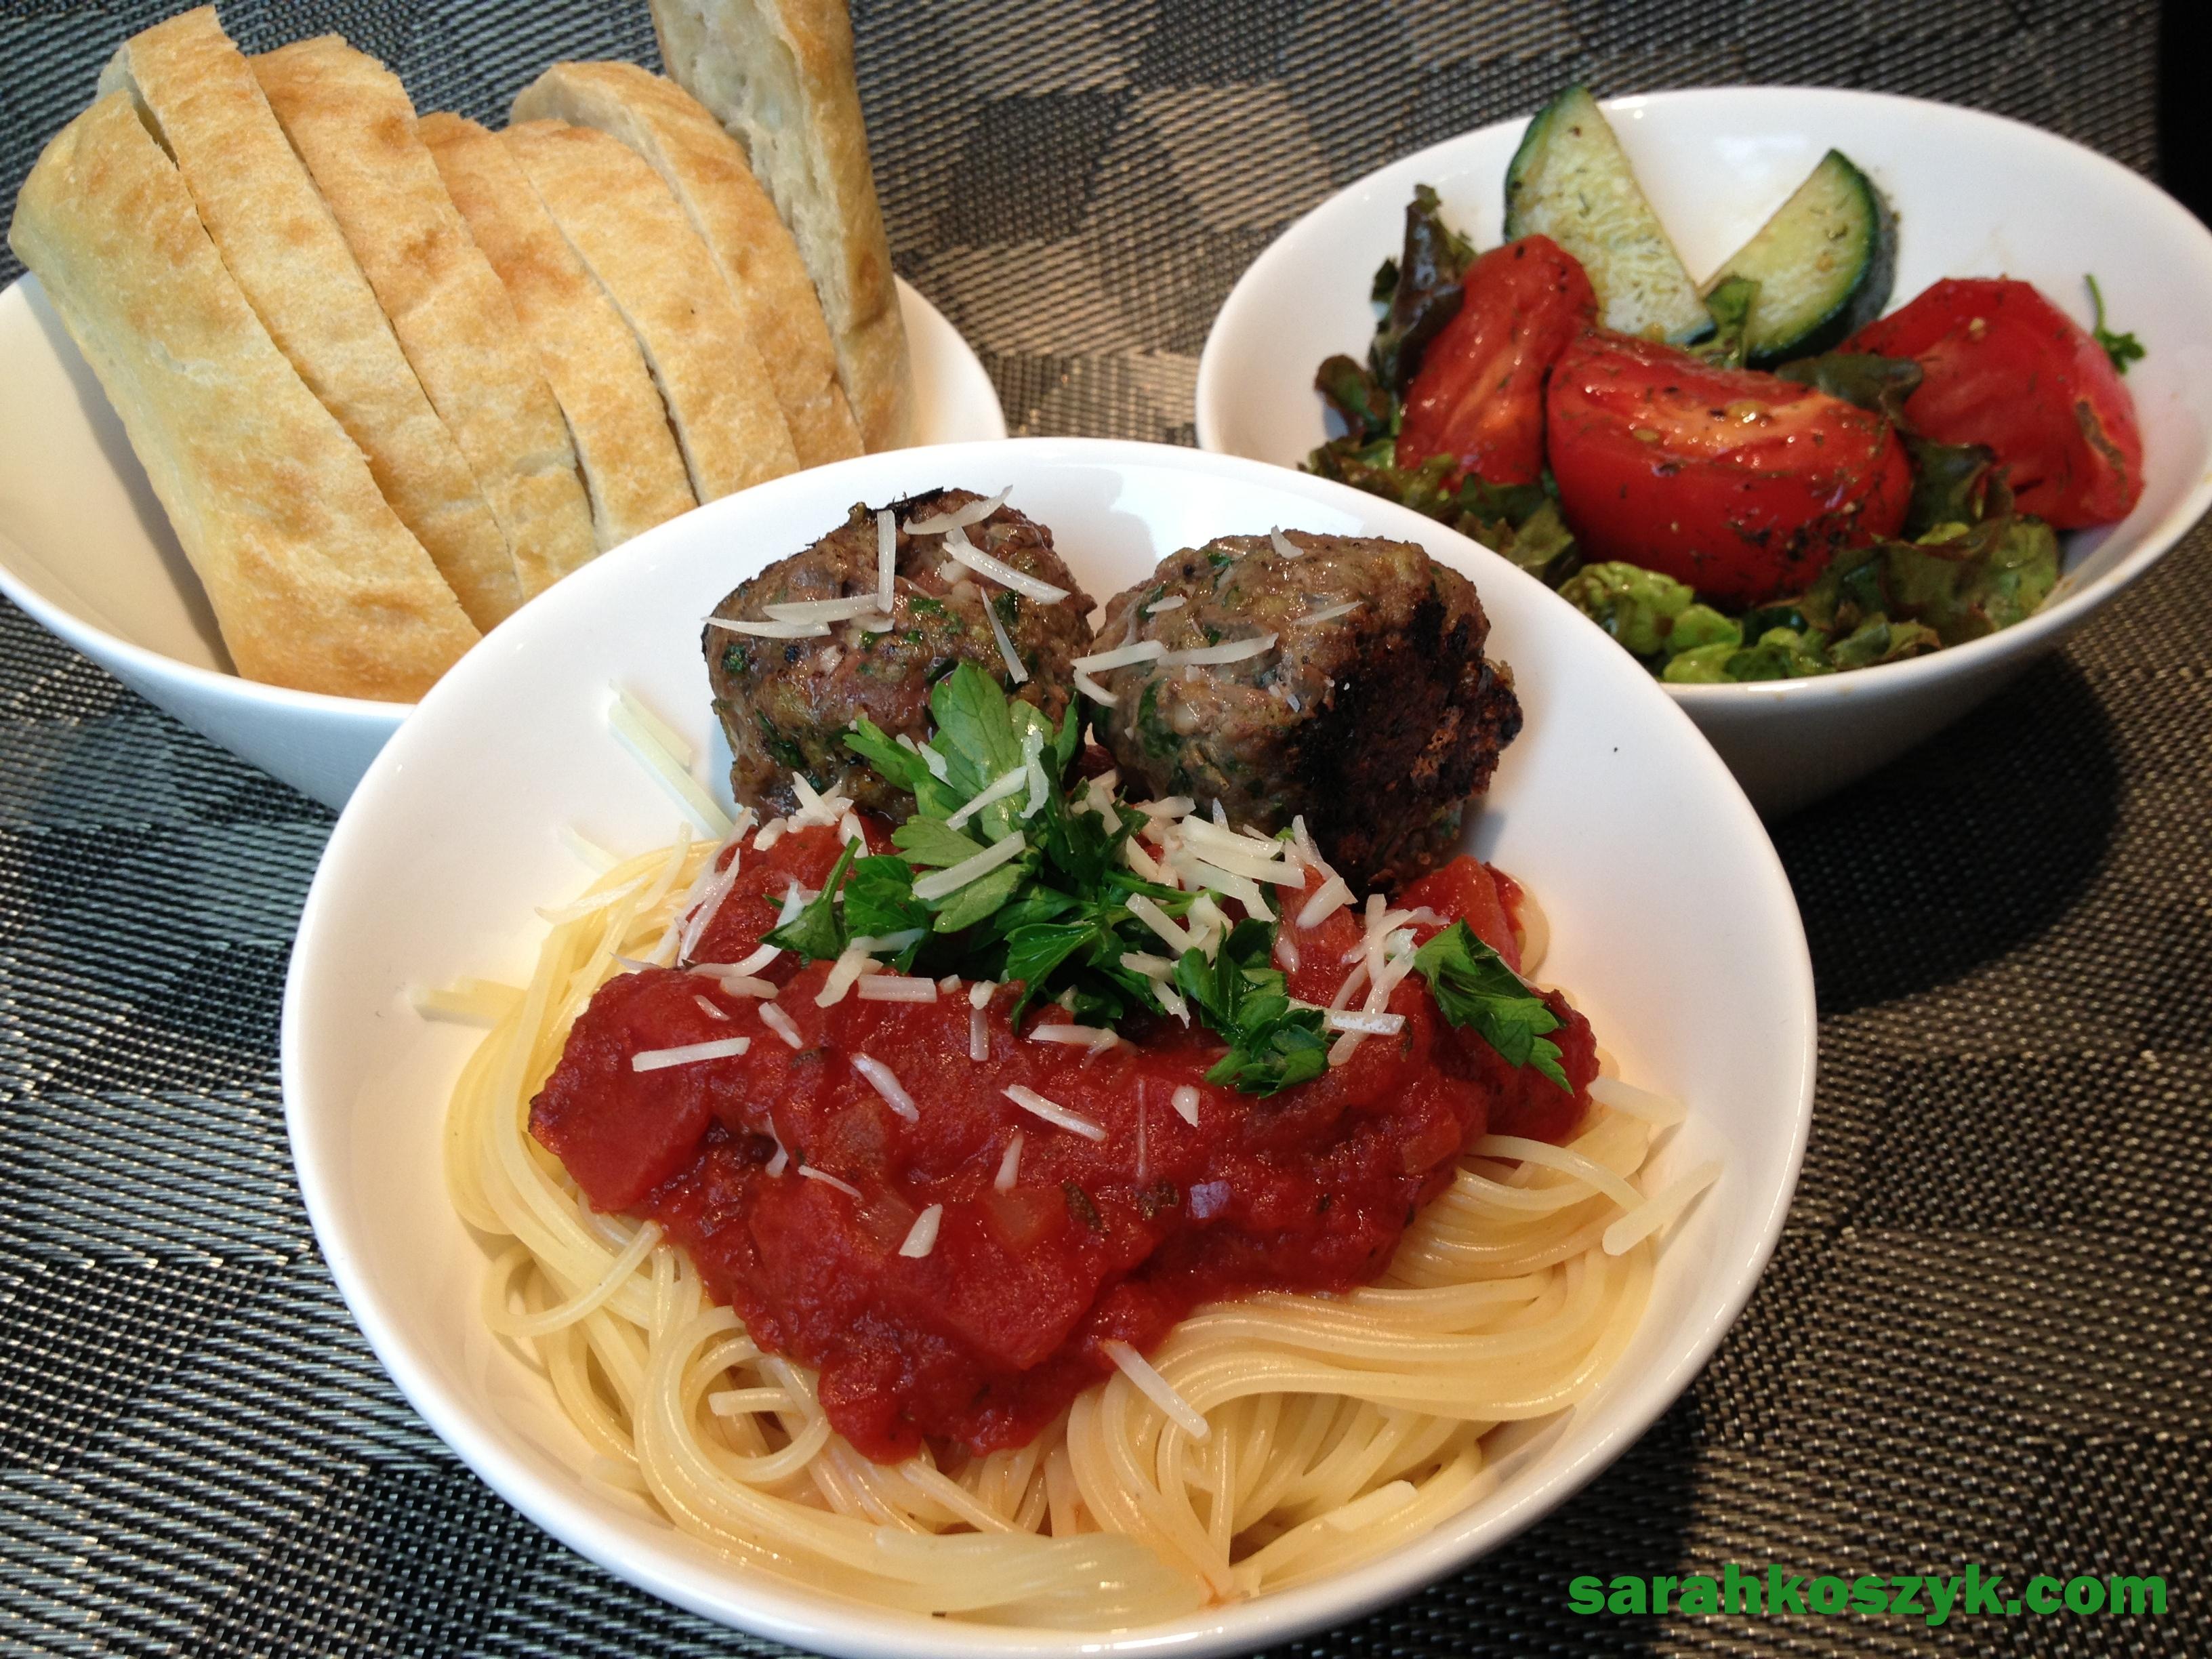 Pasta with Turkey Meatballs and Homemade Marinara Sauce